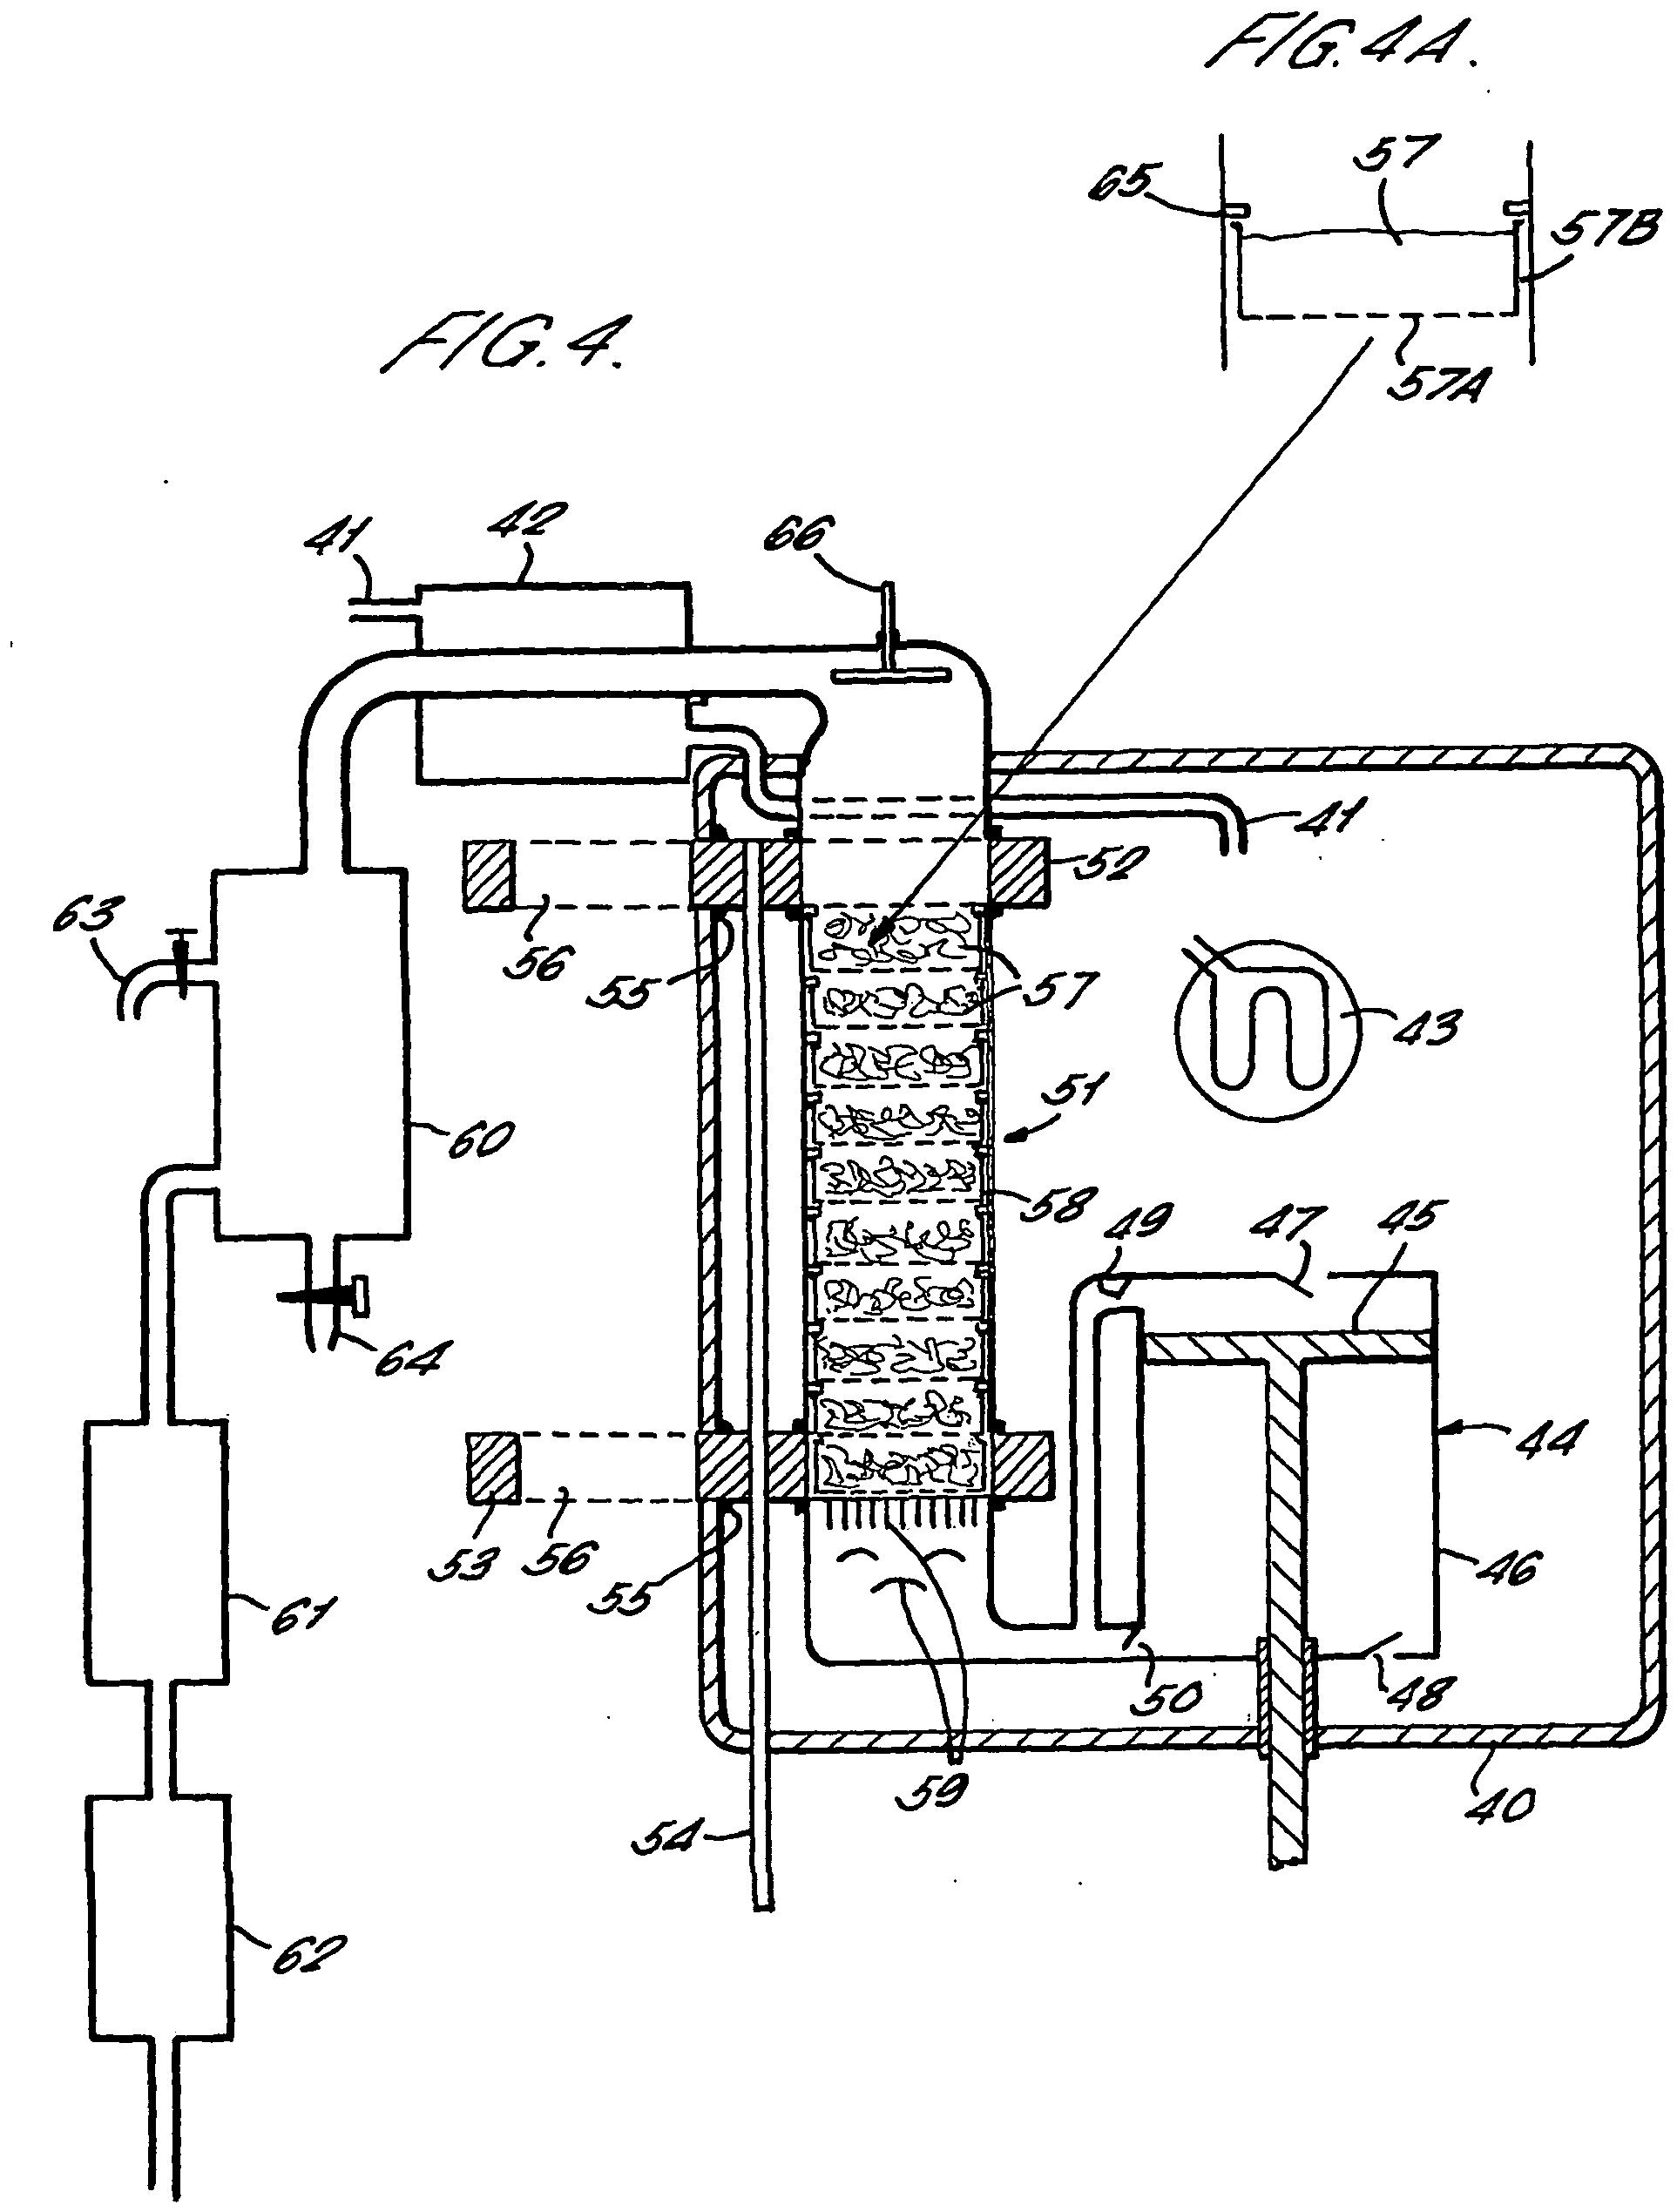 patent ep1385595b1